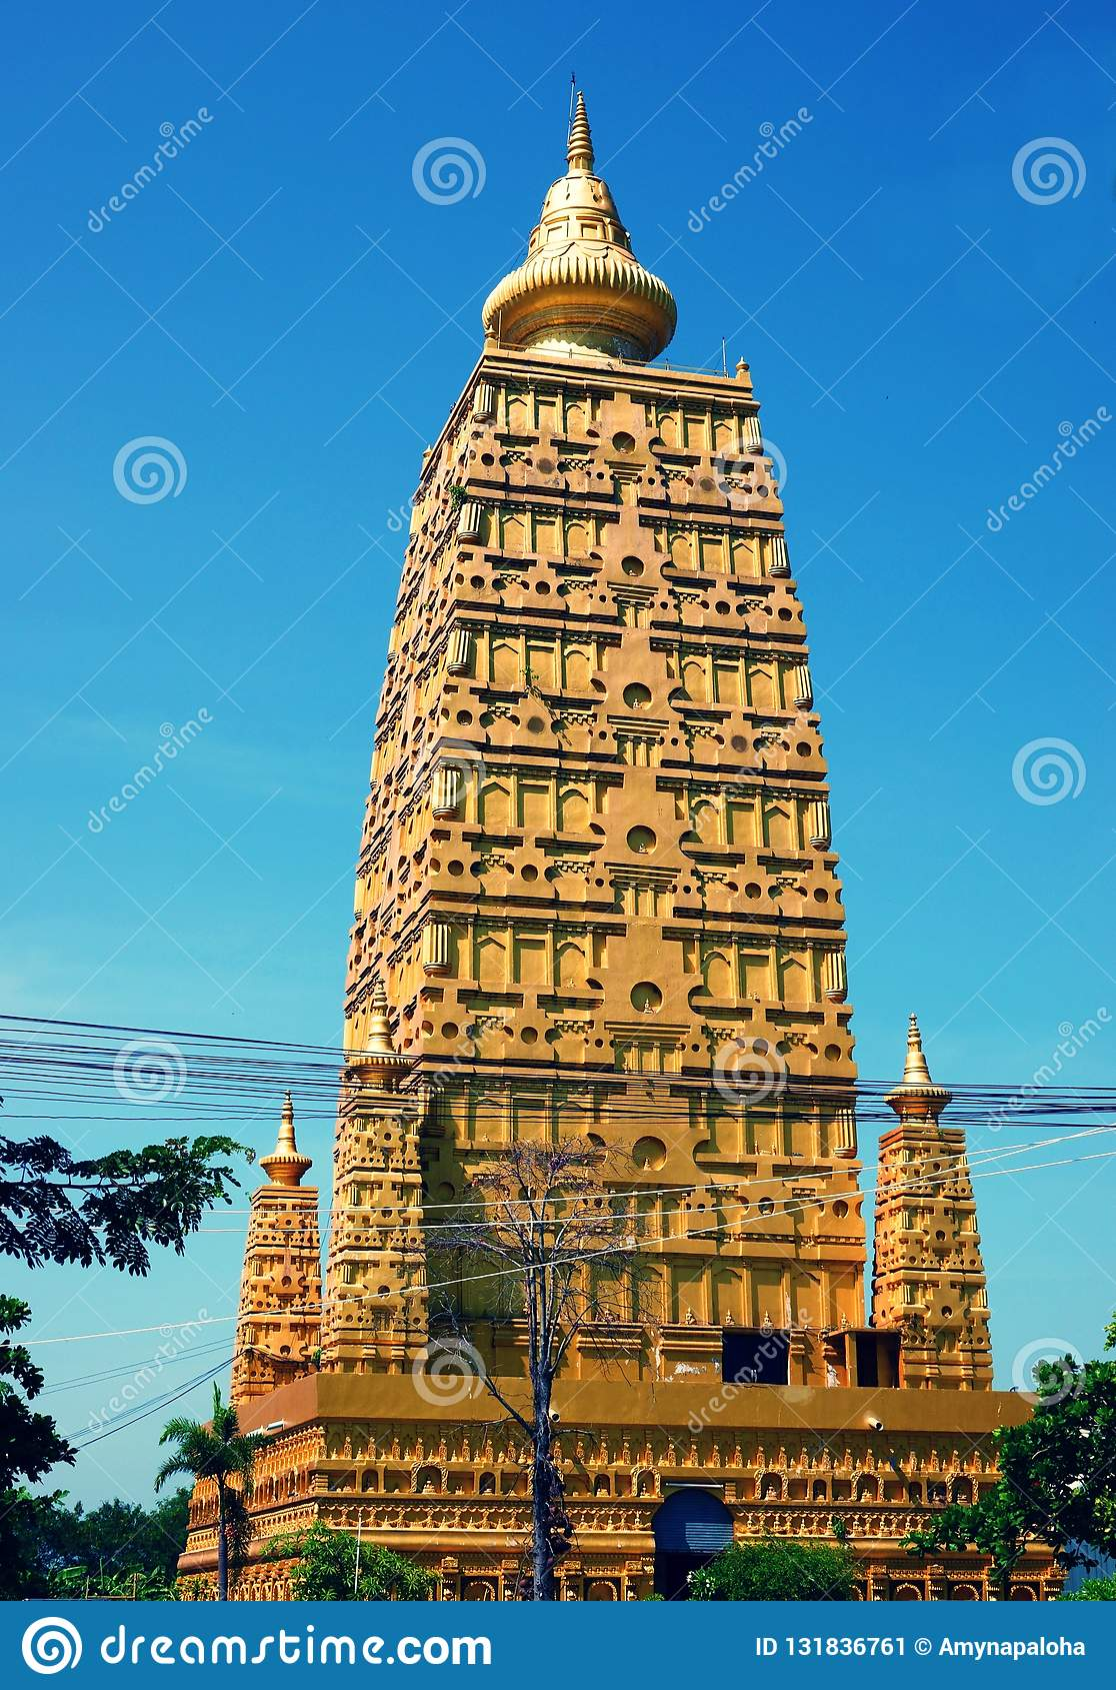 Wat Chom Phothayaram,Sothon,Mueang Chachoengsao District,thailand 4 november 2018 Thot Kathin in thailand chedi temple